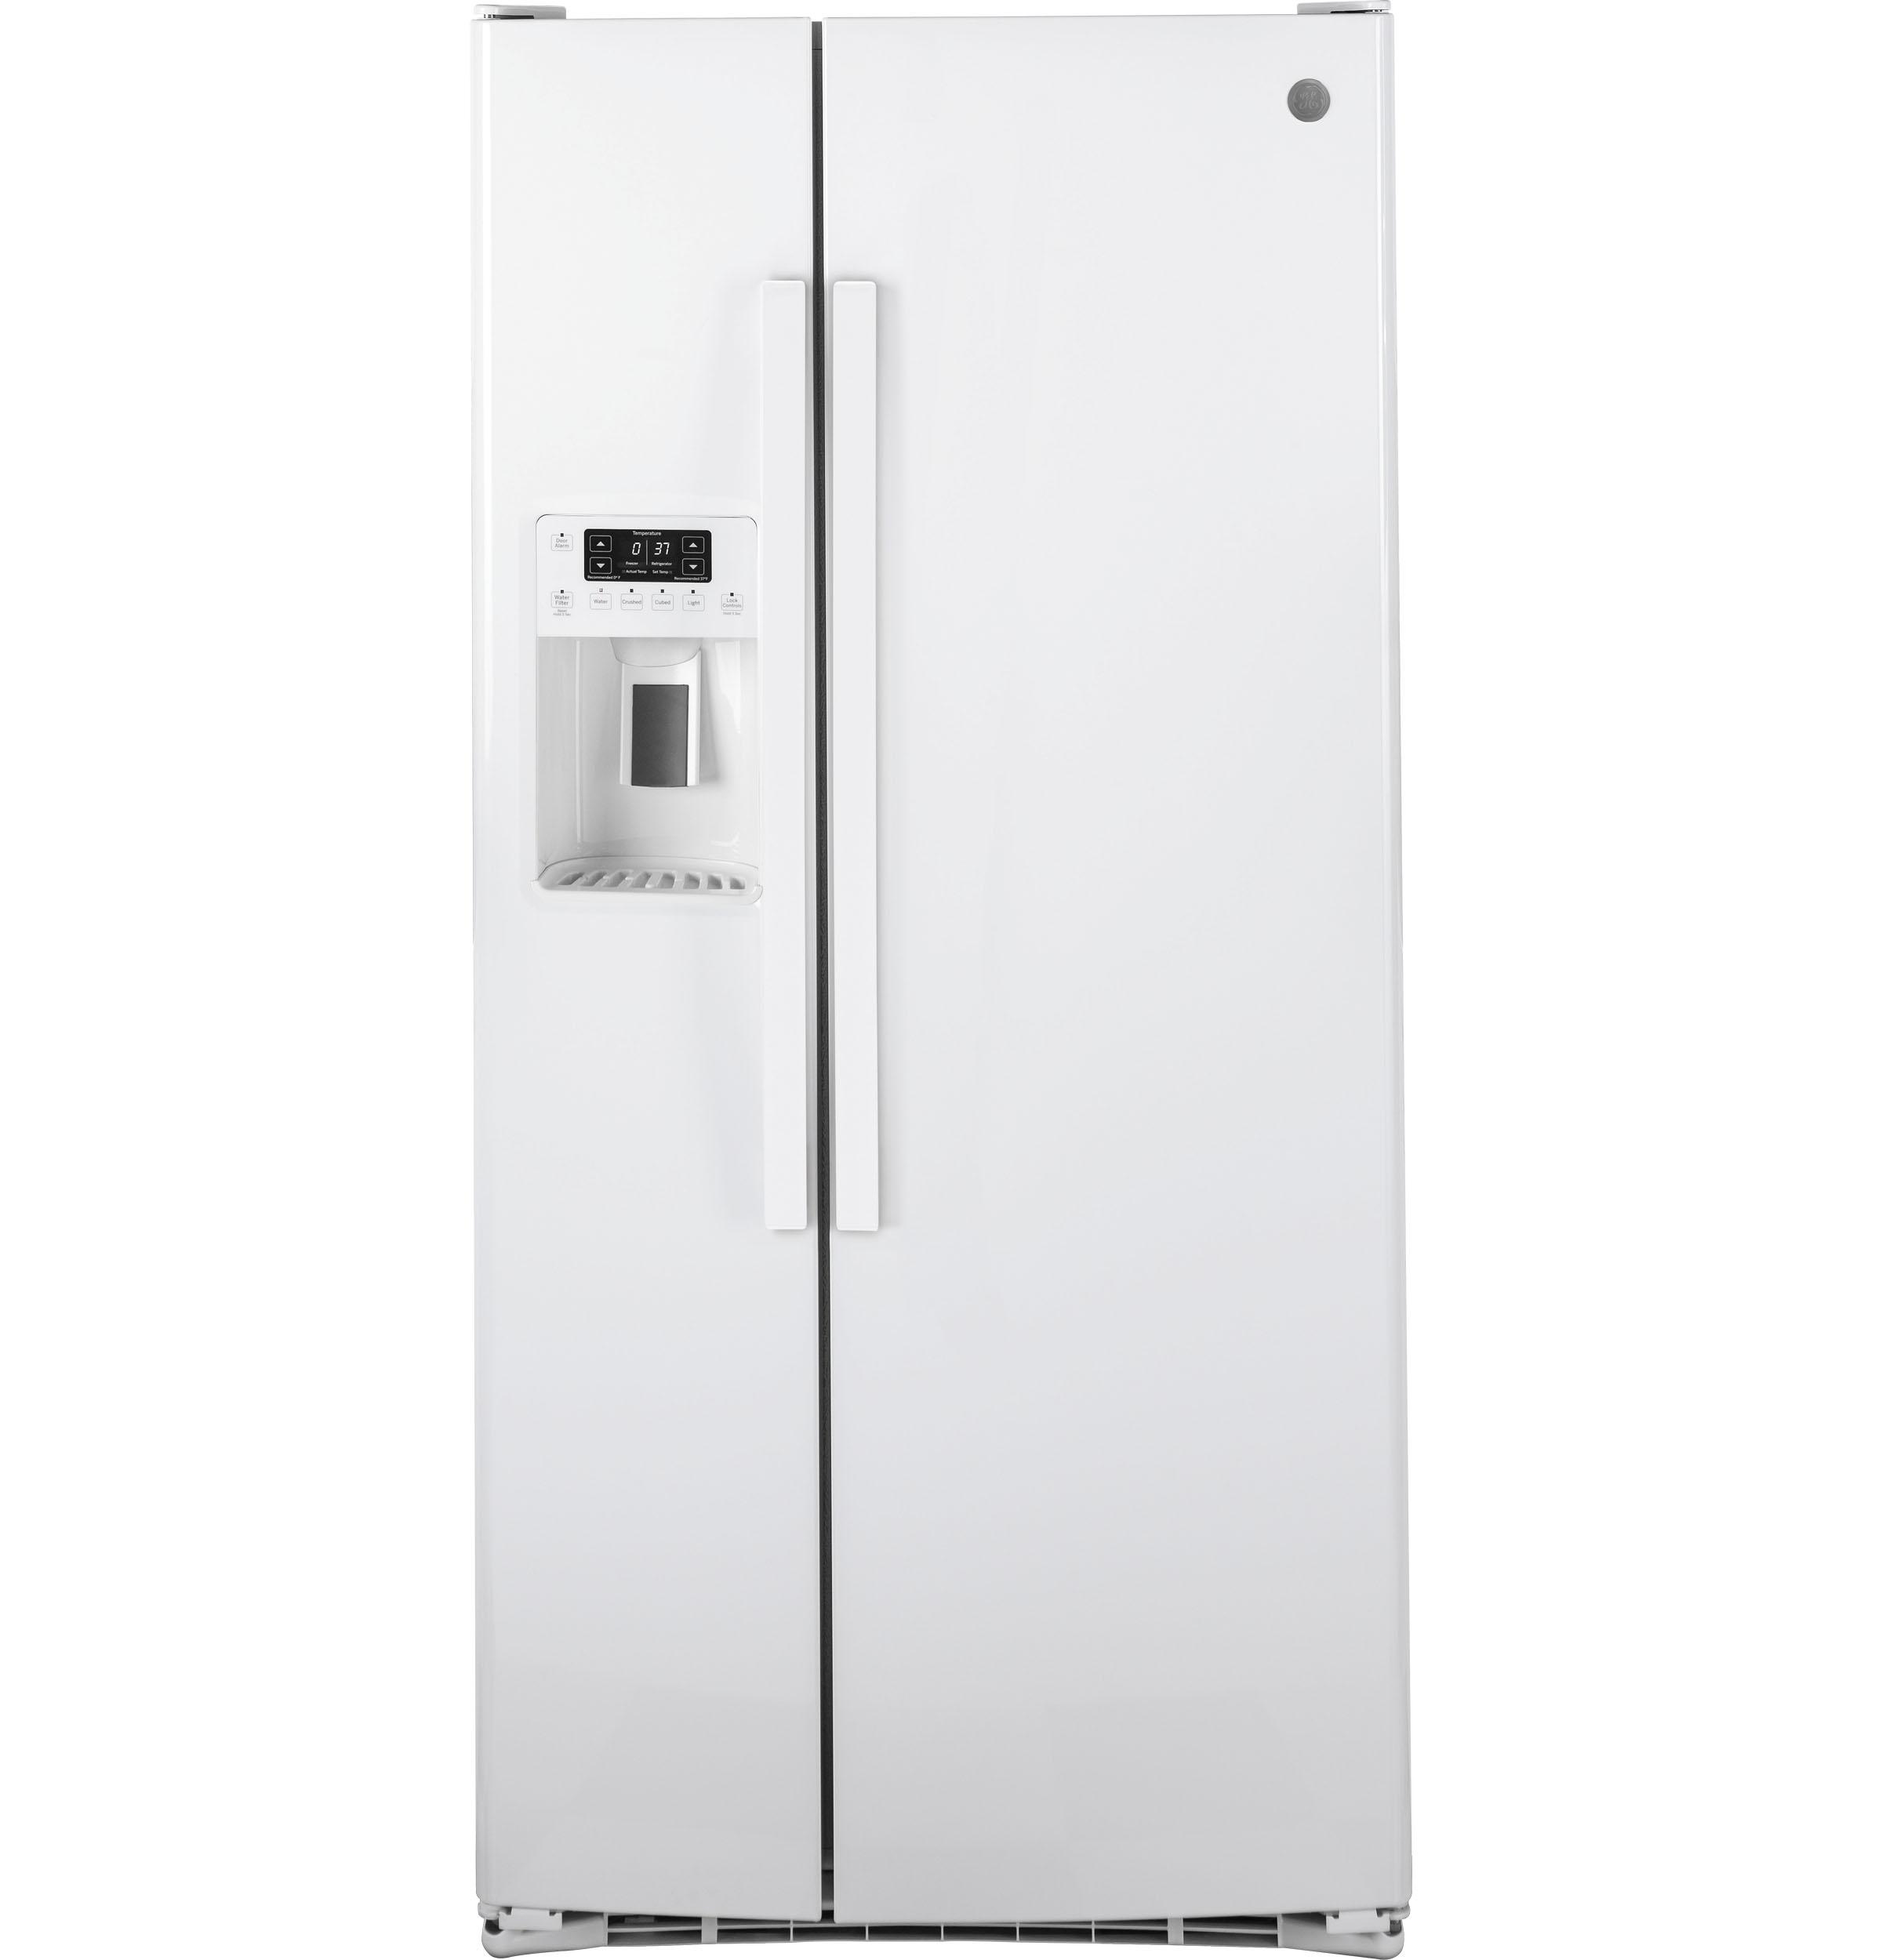 GE GE® ENERGY STAR® 23.2 Cu. Ft. Side-By-Side Refrigerator